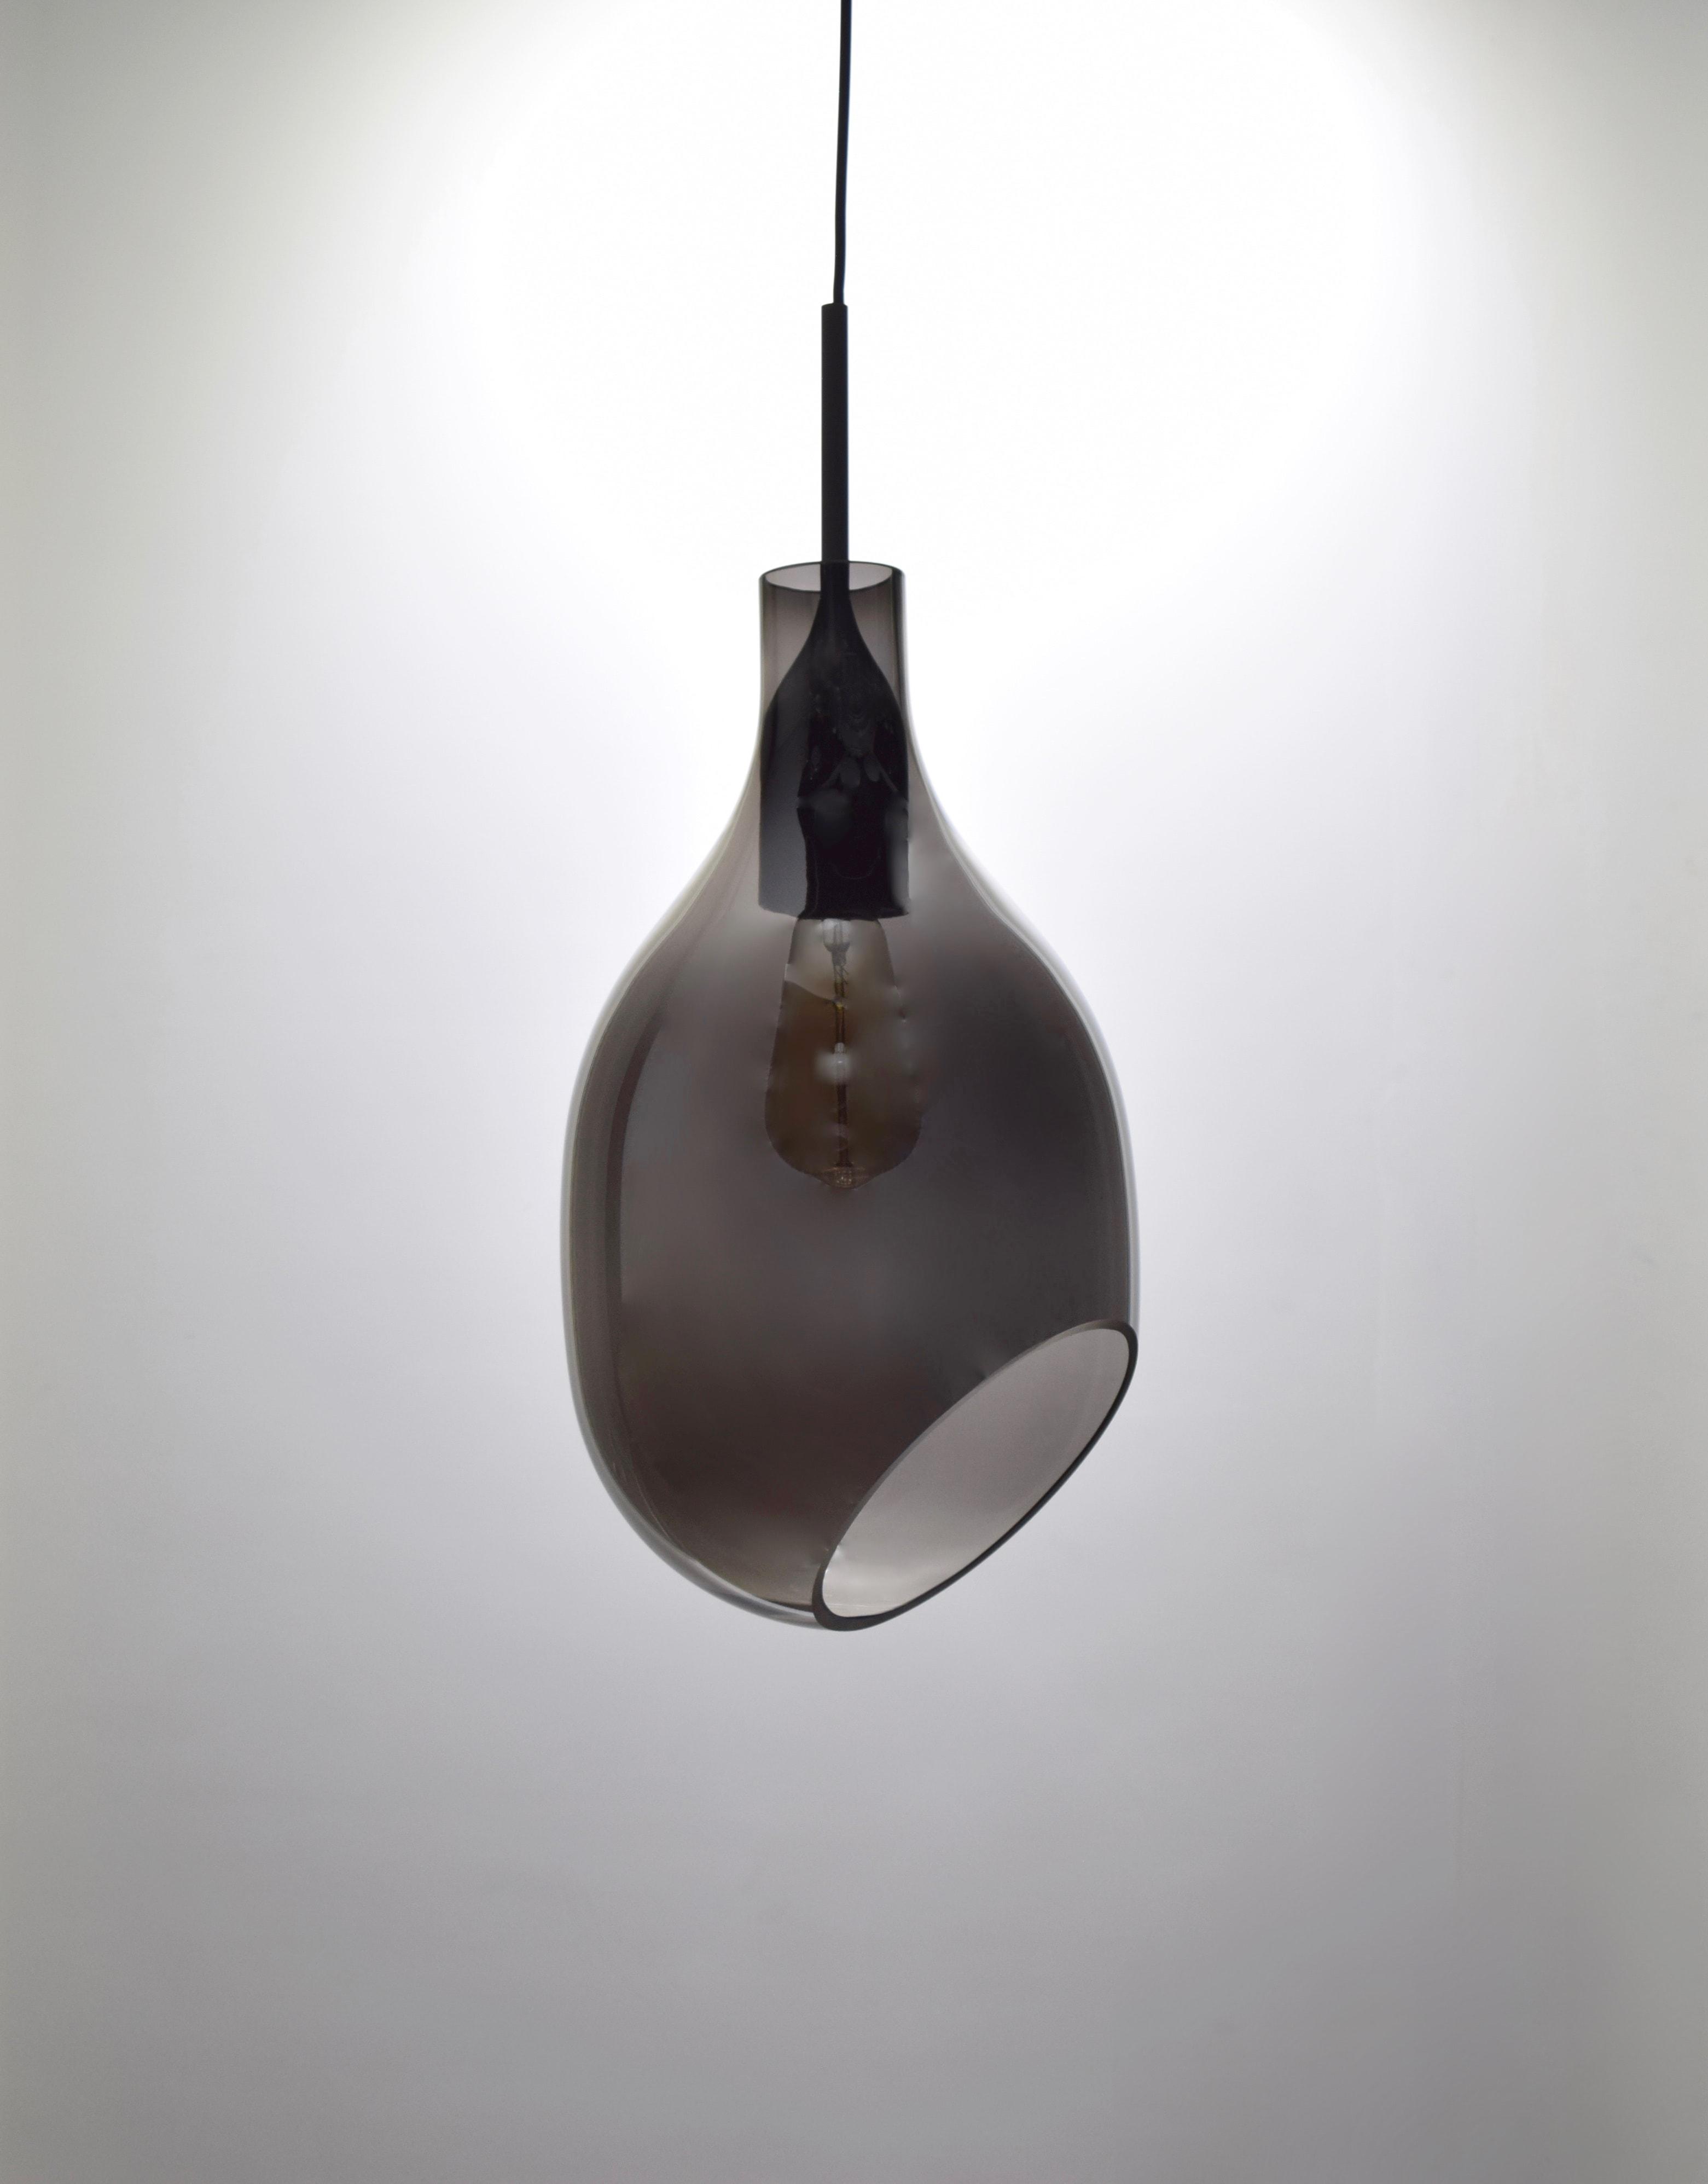 VESSEL 斜口玻璃煙灰色吊燈-BNL00127 0